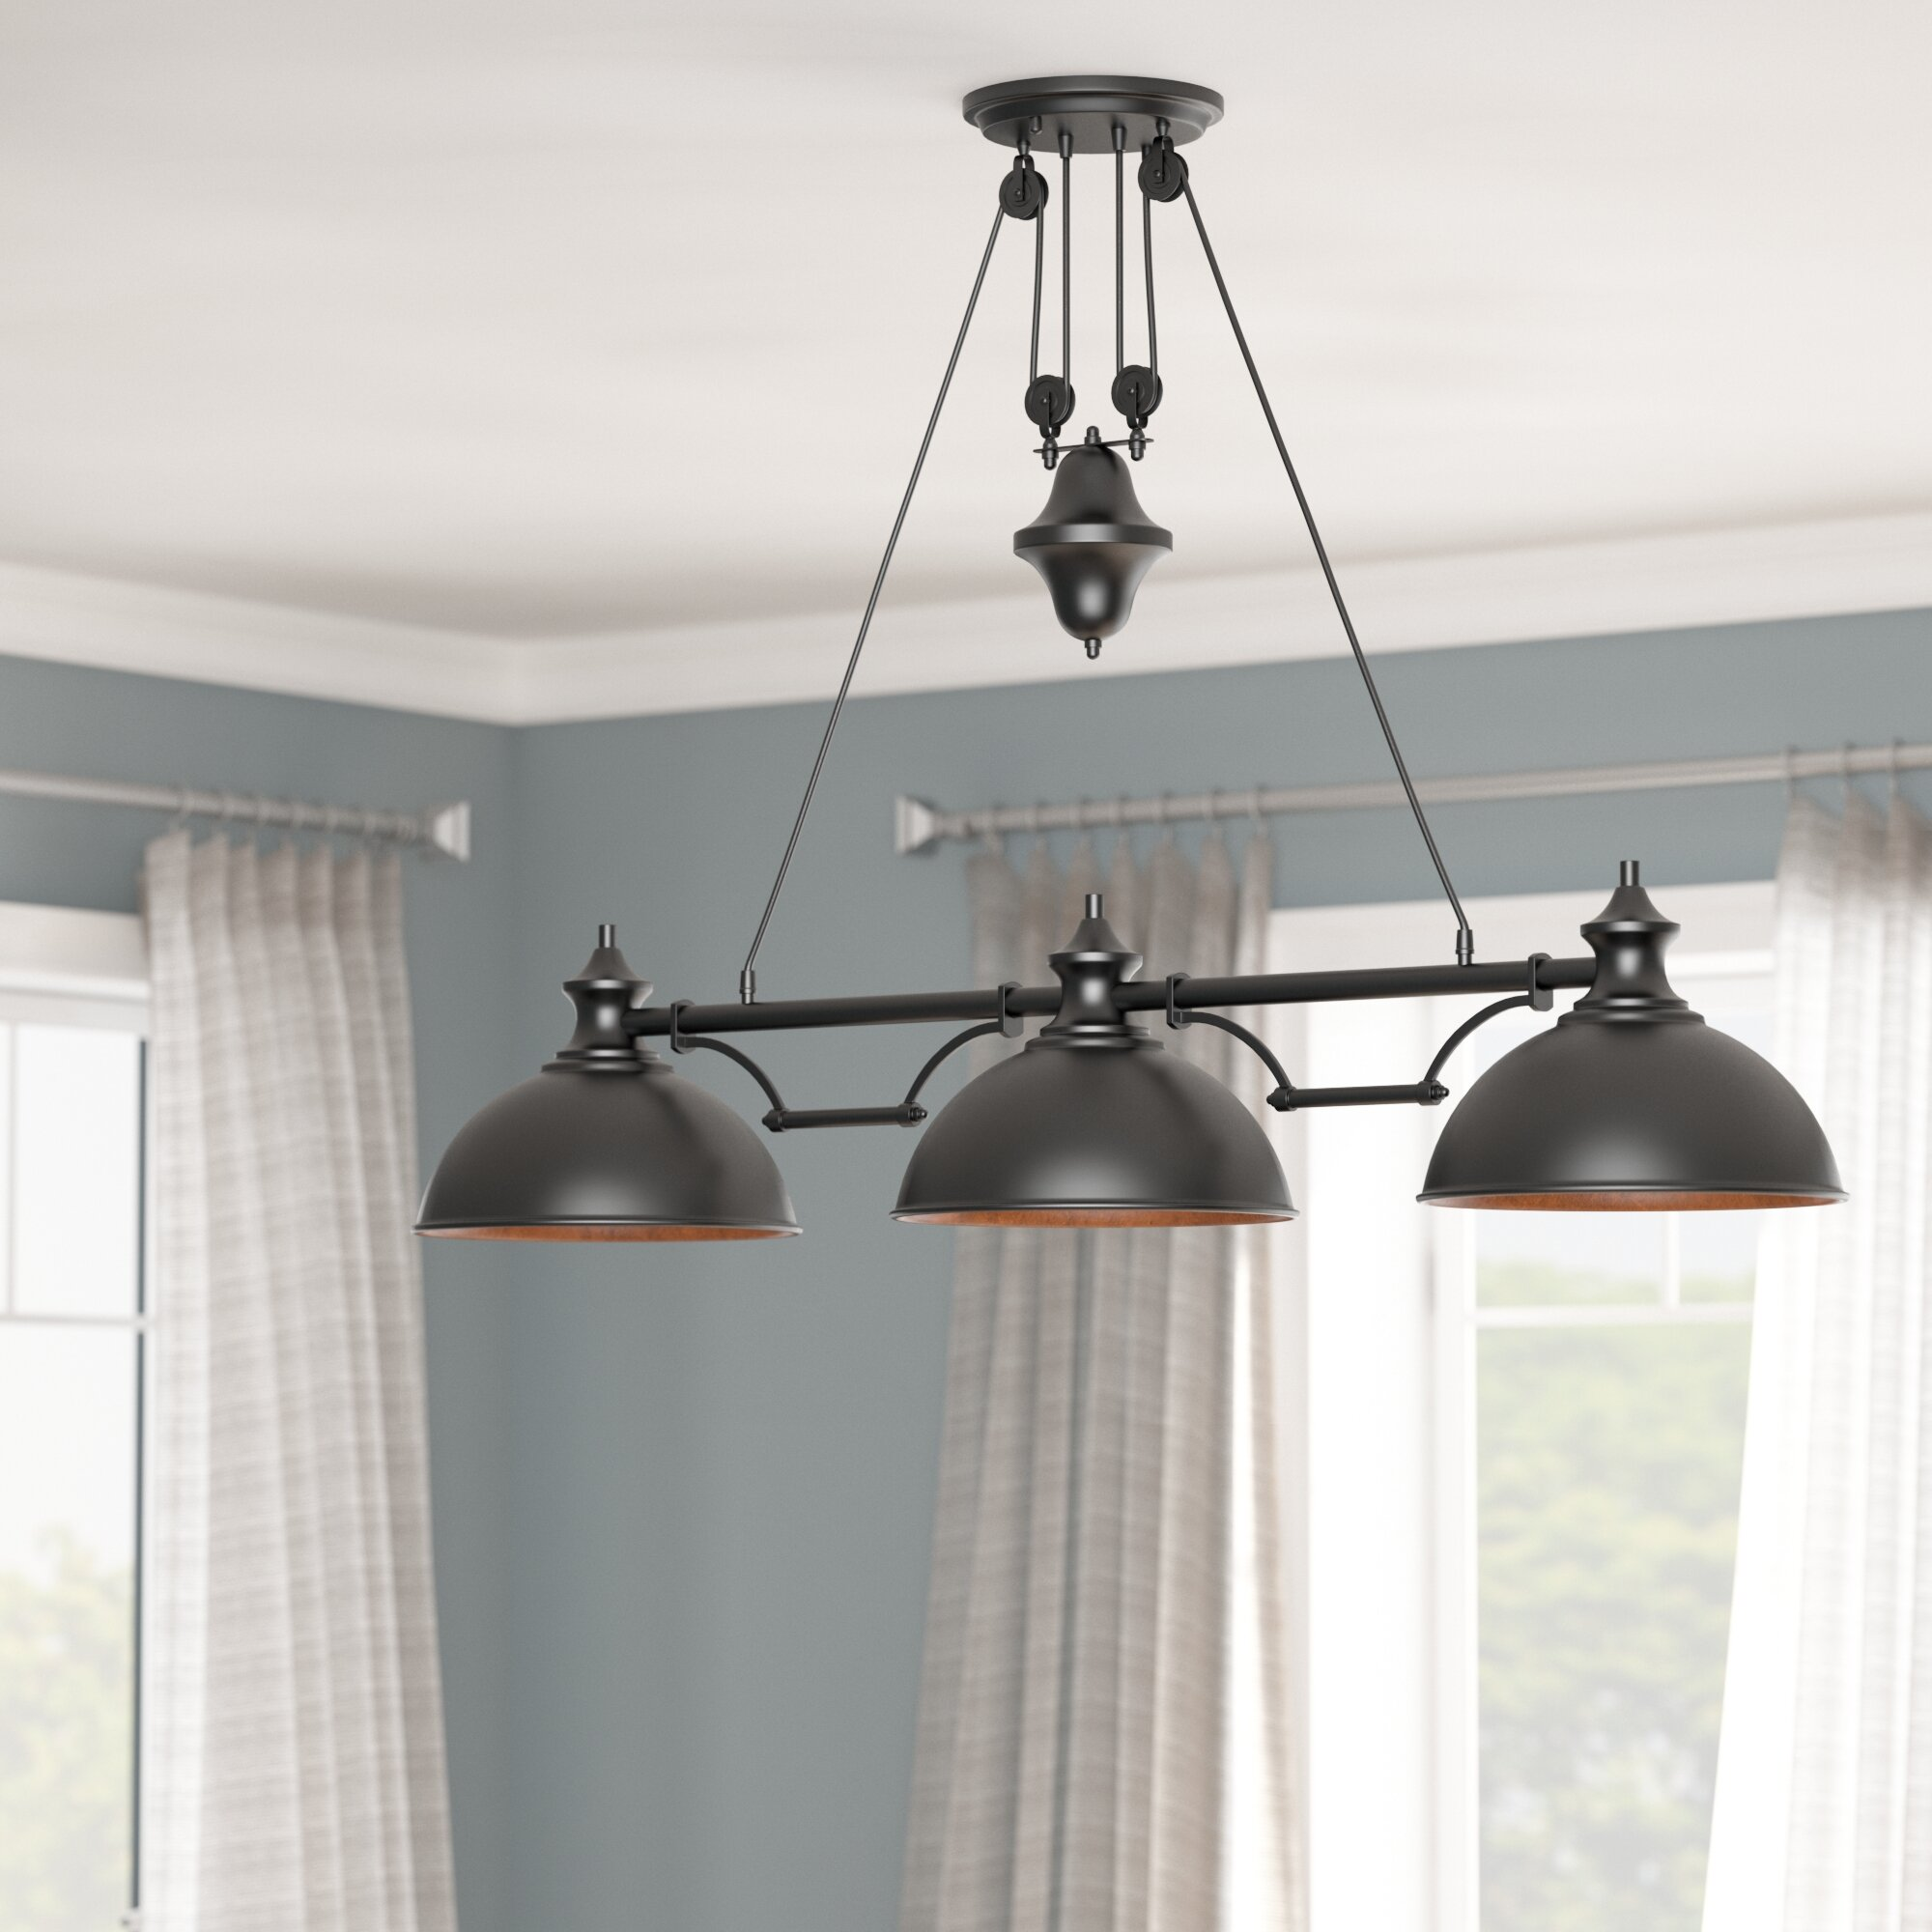 Kitchen Island Modern Farmhouse Pendant Lighting You Ll Love In 2020 Wayfair